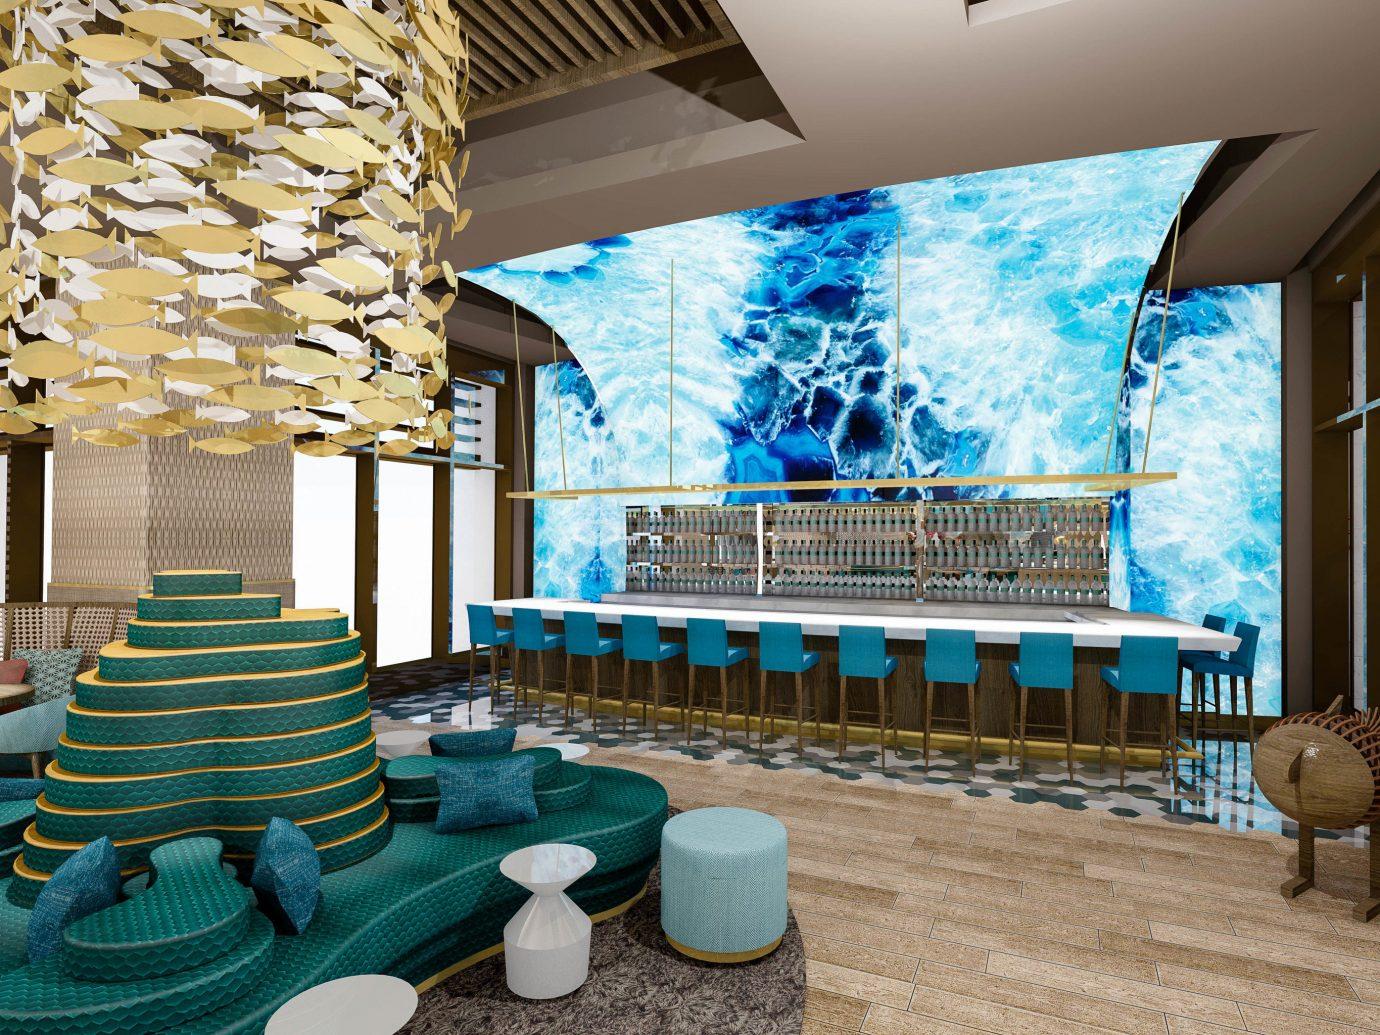 Beach Summer Travel Trip Ideas room interior design Lobby ceiling home living room